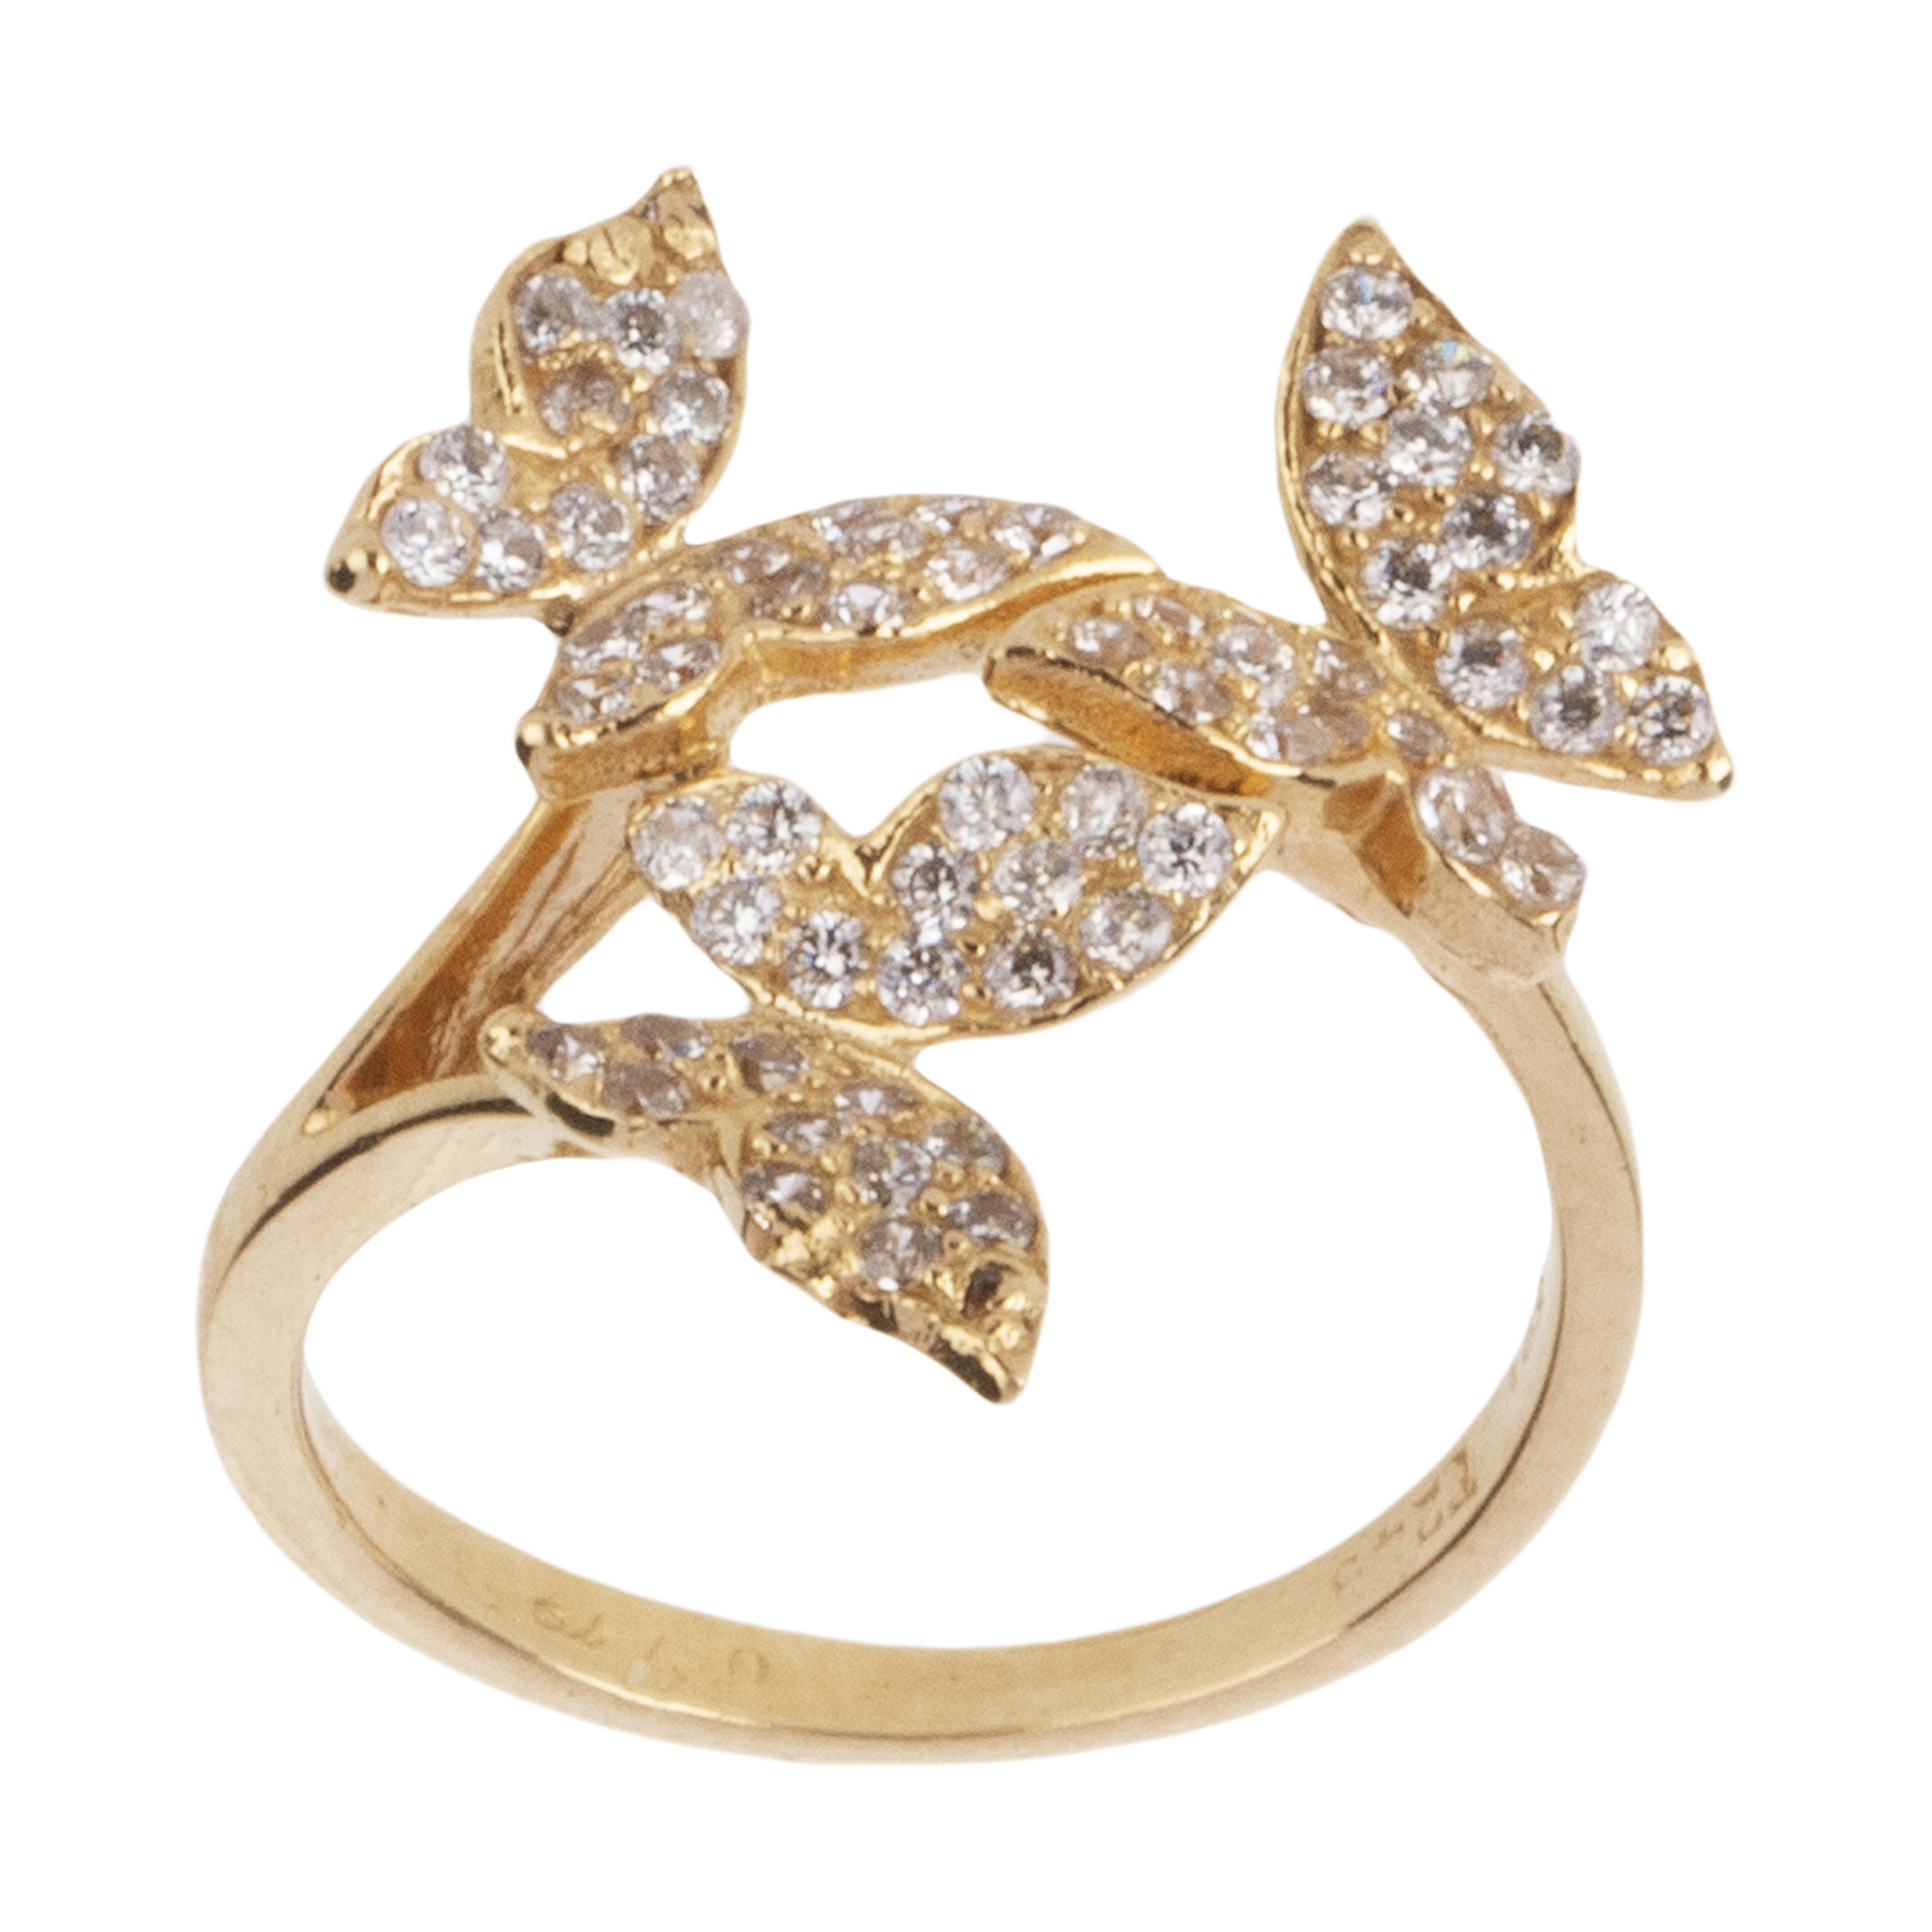 انگشتر طلا 18 عیار زنانه میو گلد مدل GD567-51